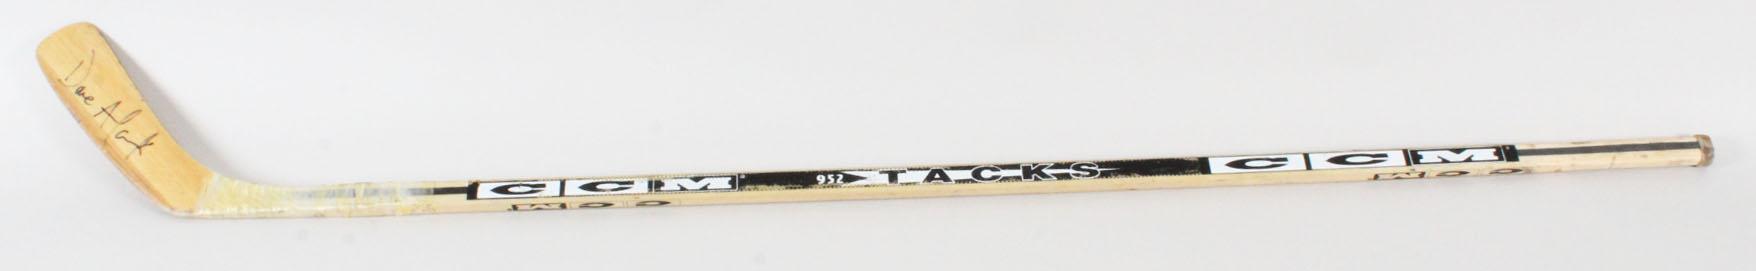 Dave Andreychuk Game-Used Hockey Stick Signed - COA 100% Authentic Team